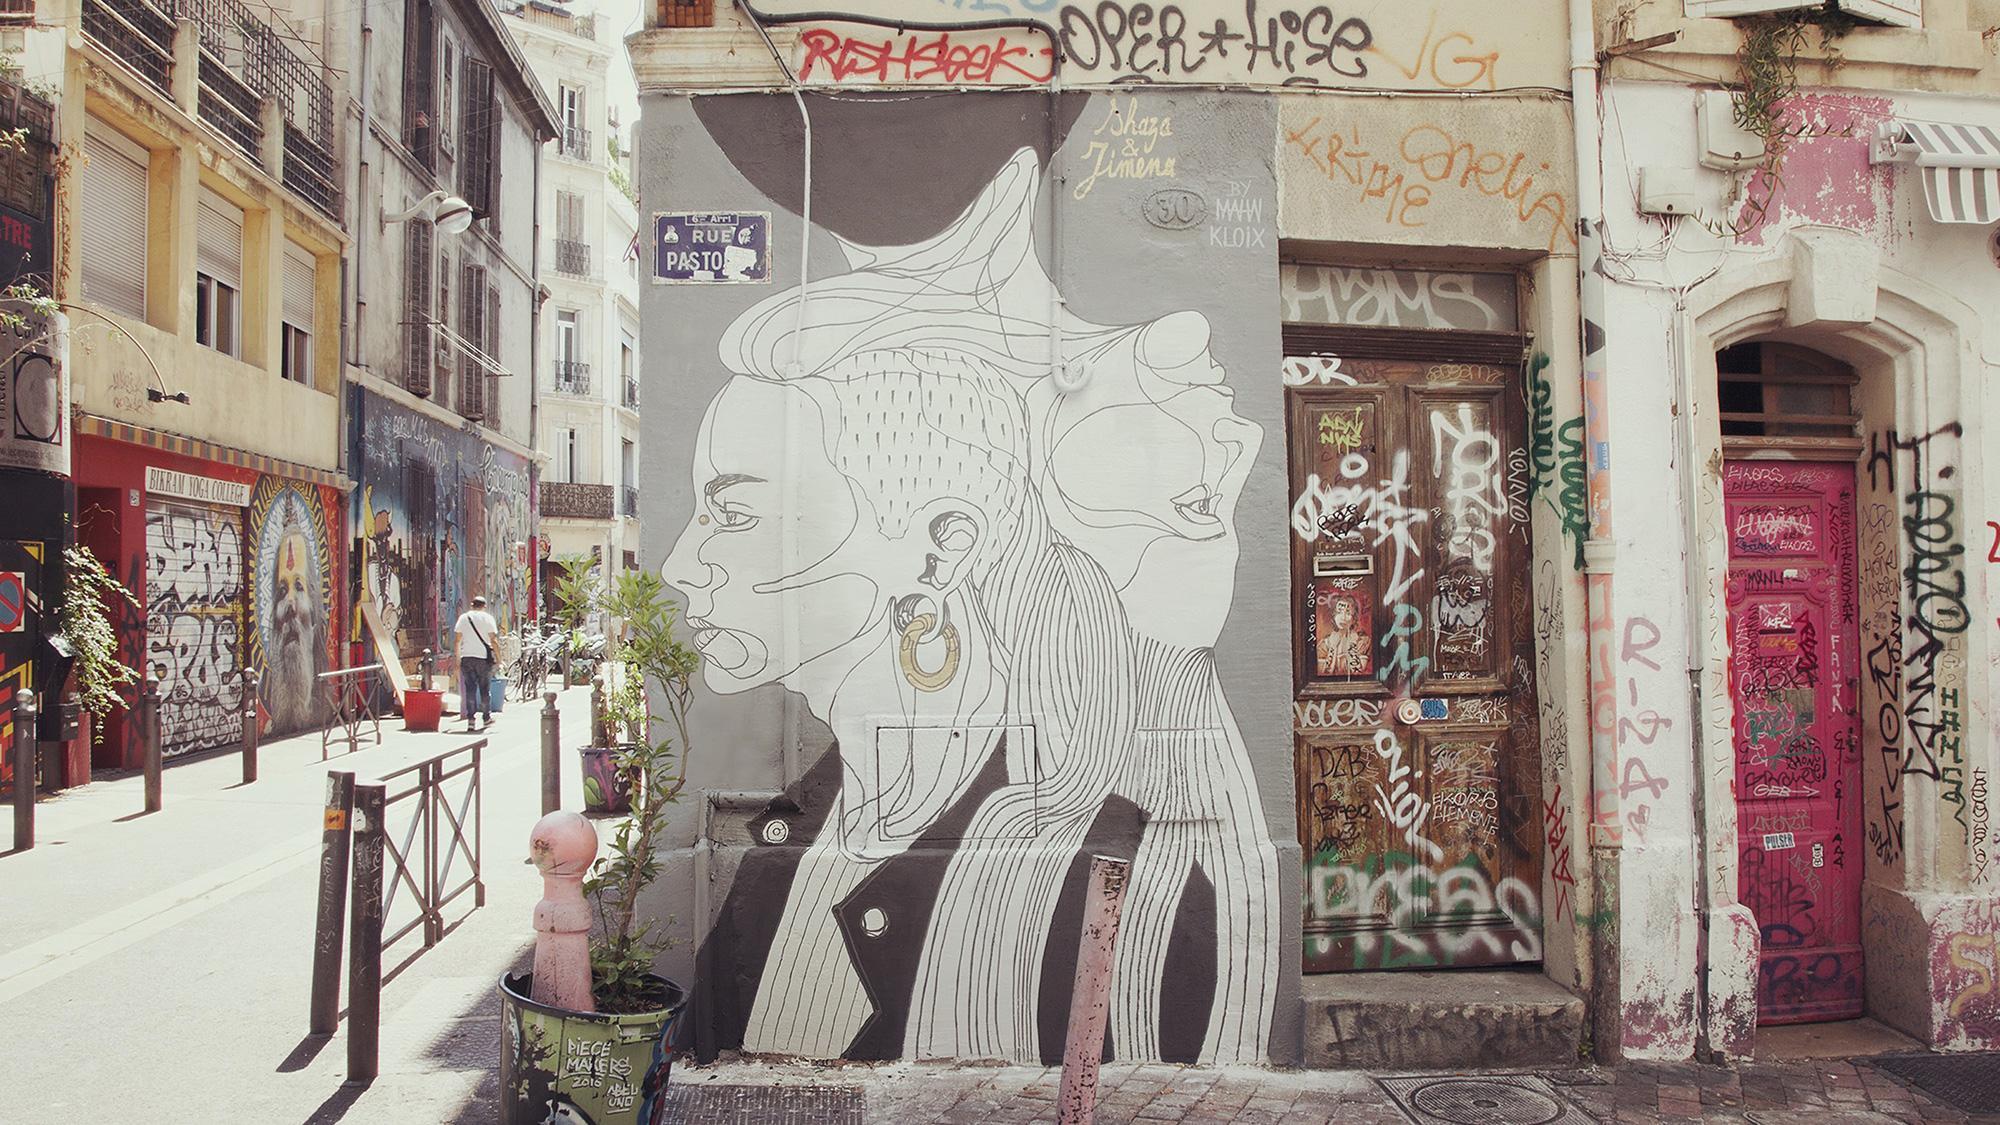 mahn kloix mur oberkampf stret art art urbain urban art artistik rezo paris